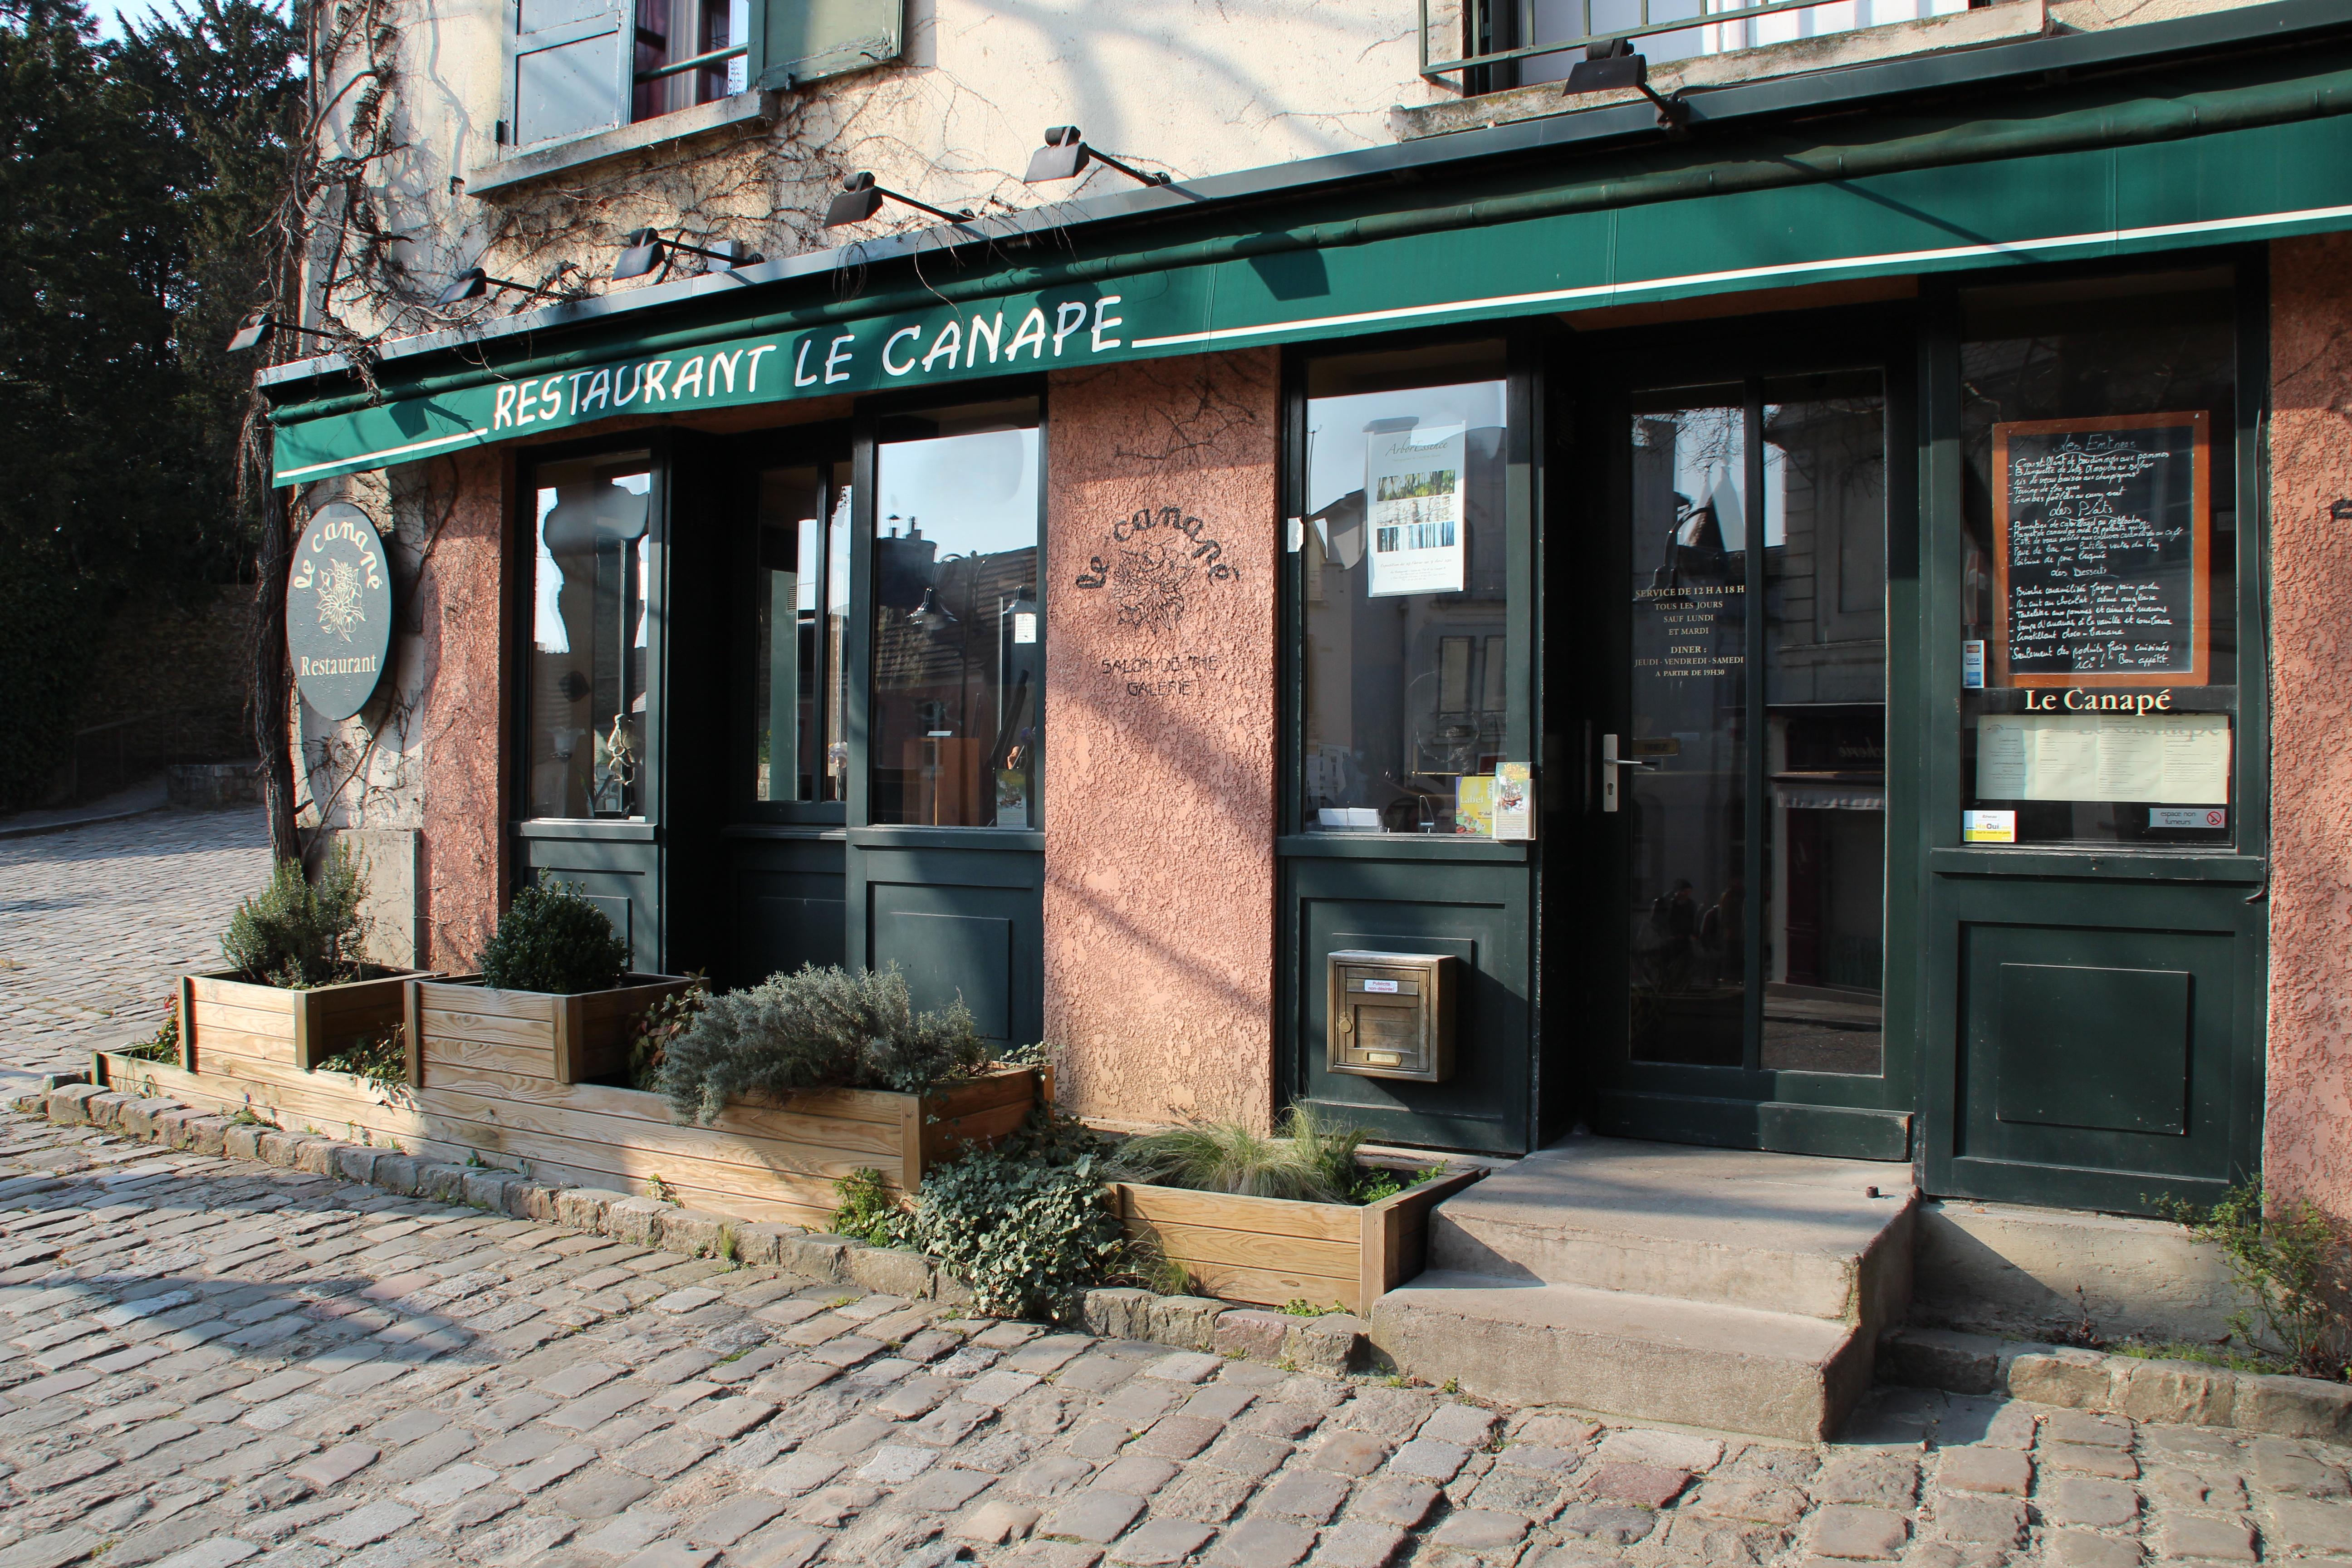 Restaurant Rue Gustave Eiffel  Orl Ef Bf Bdans